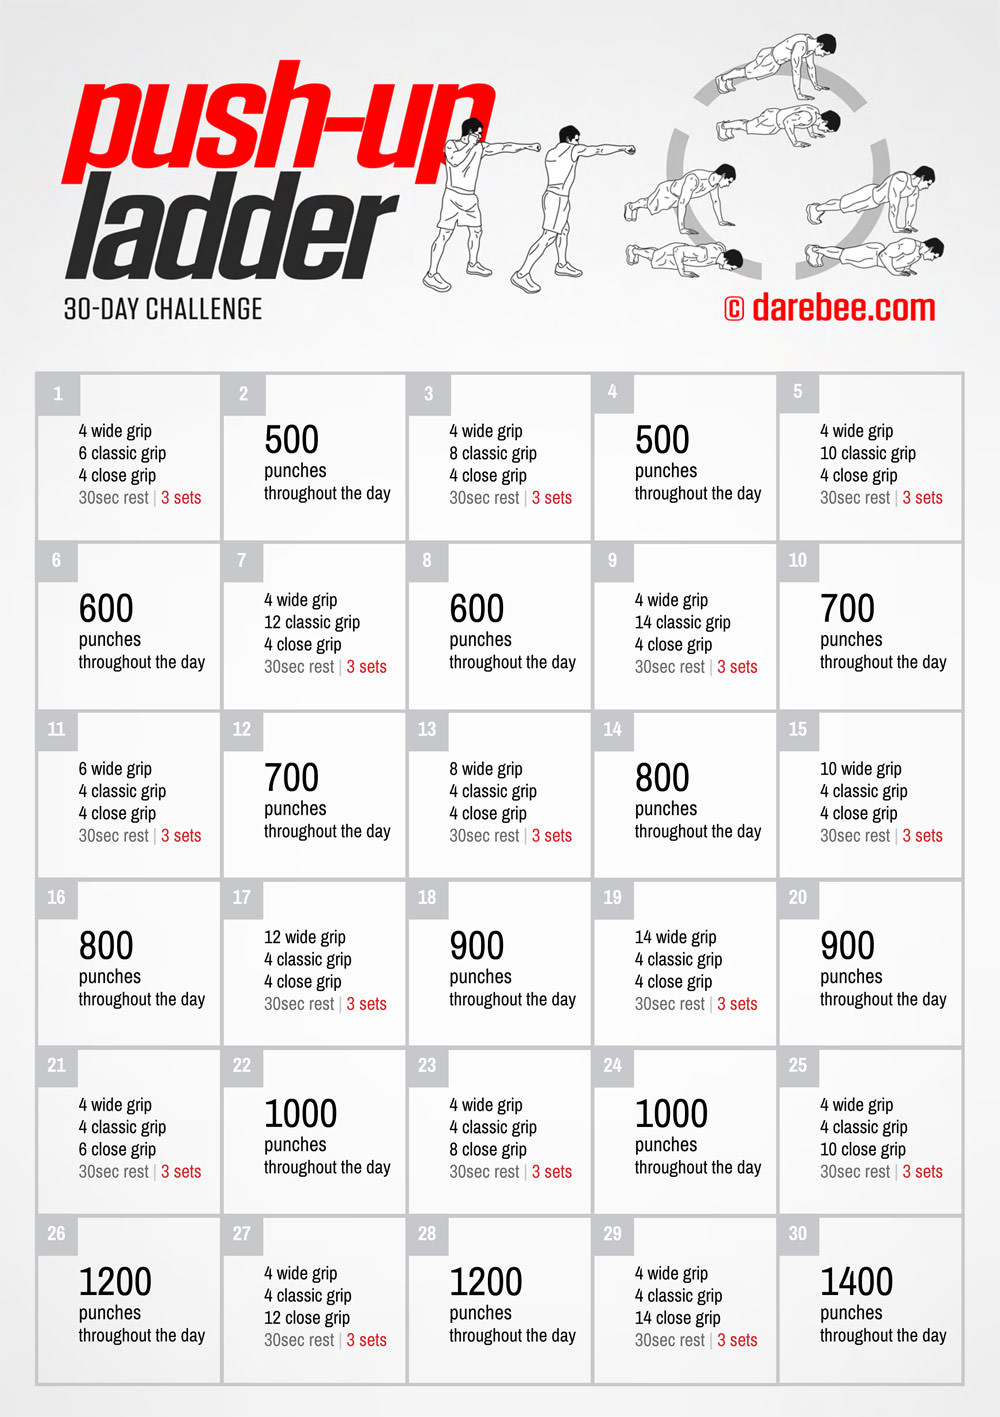 Push Ups Ladder Challenge 30 Day Pushups Challenge 30 Day Pushup Challenge 30 Day Push Up 30 Day Workout Challenge